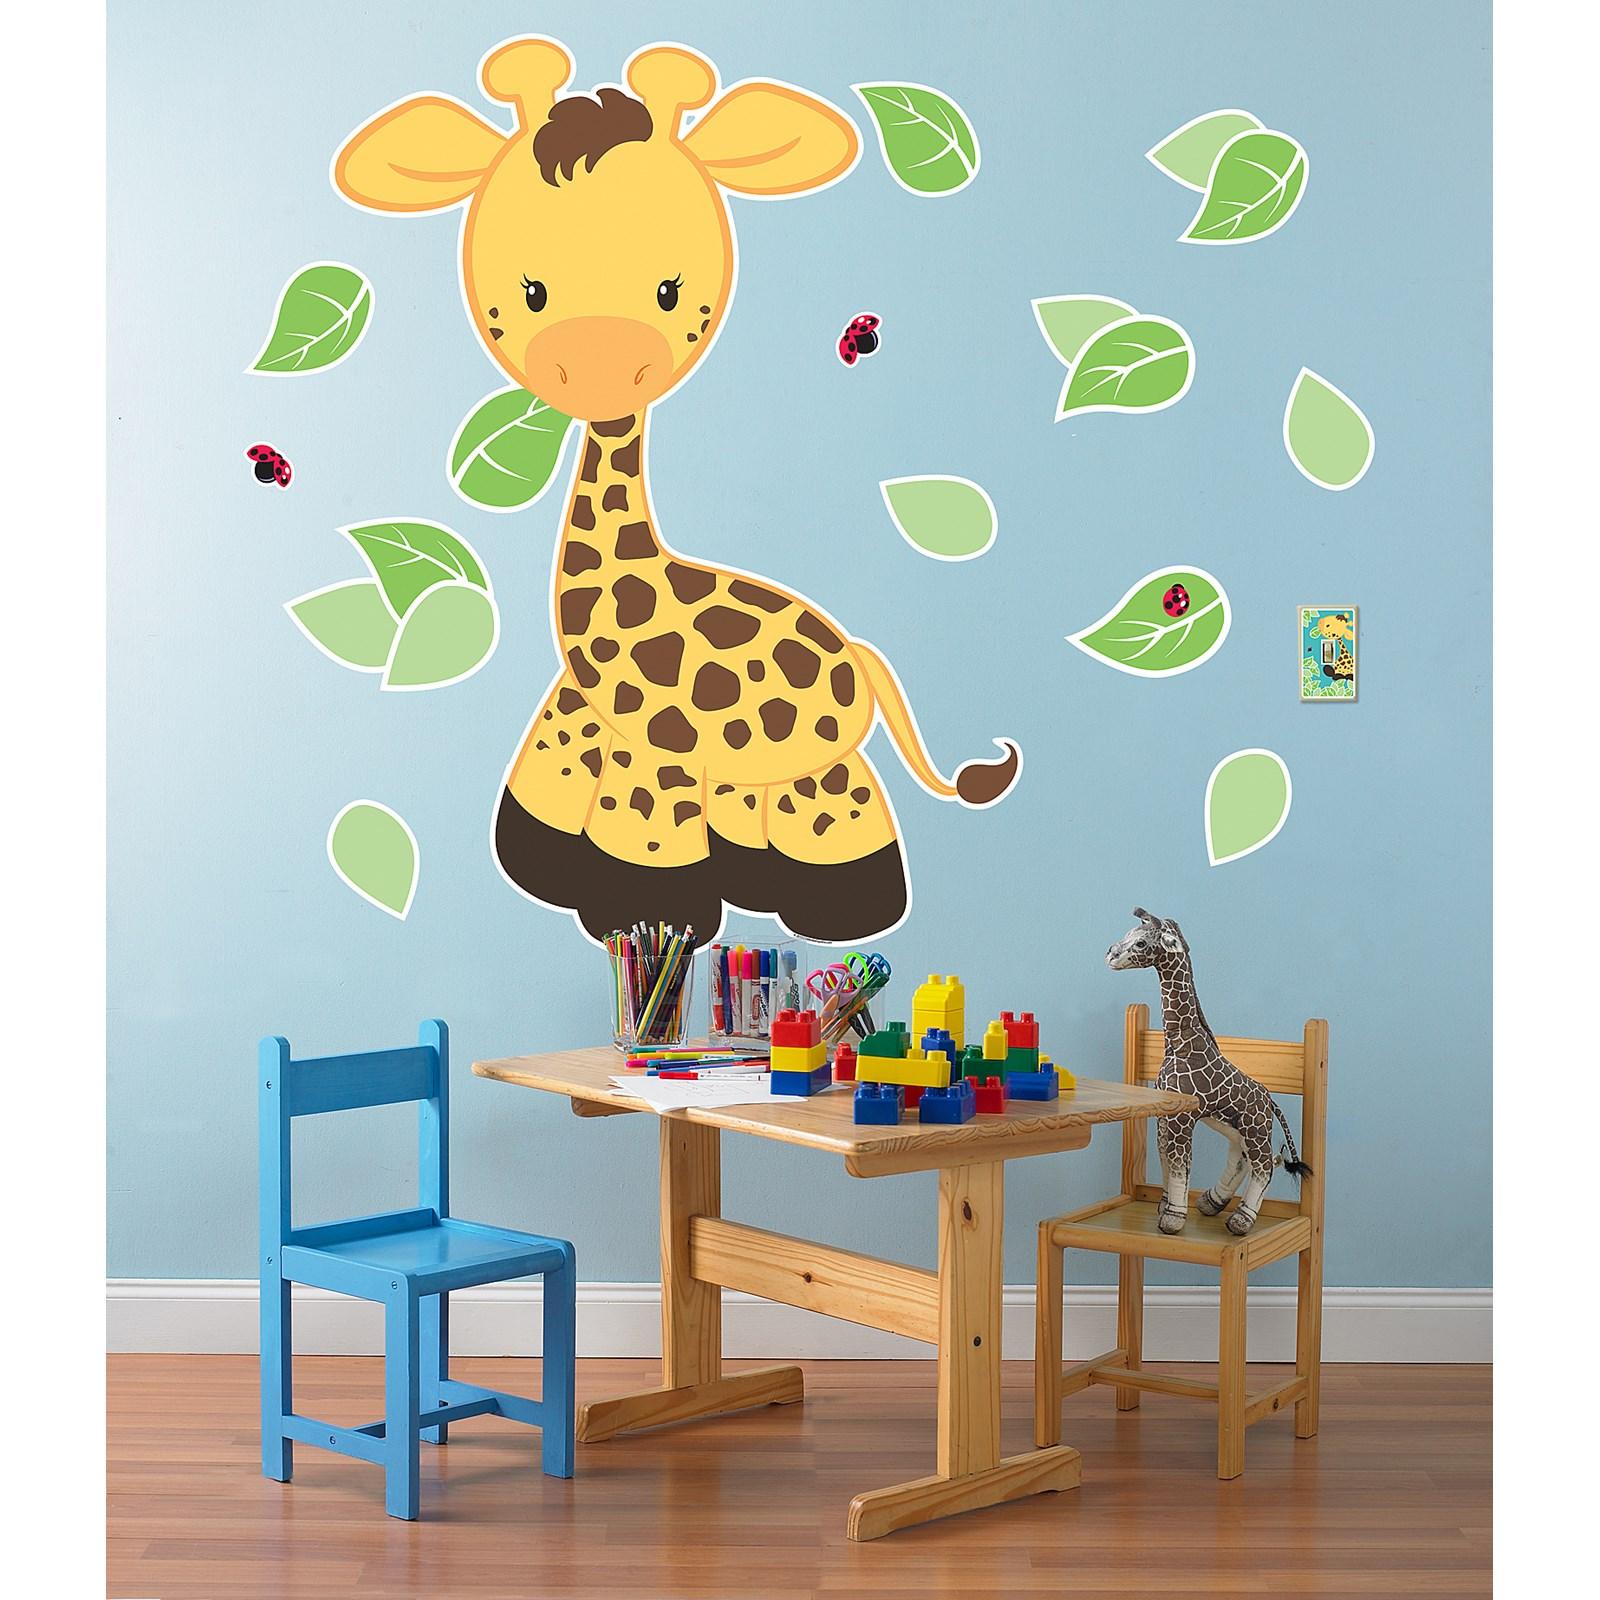 100 teal wall stickers softball sports decor vinyl decal teal wall stickers giraffe giant wall decals birthdayexpress com